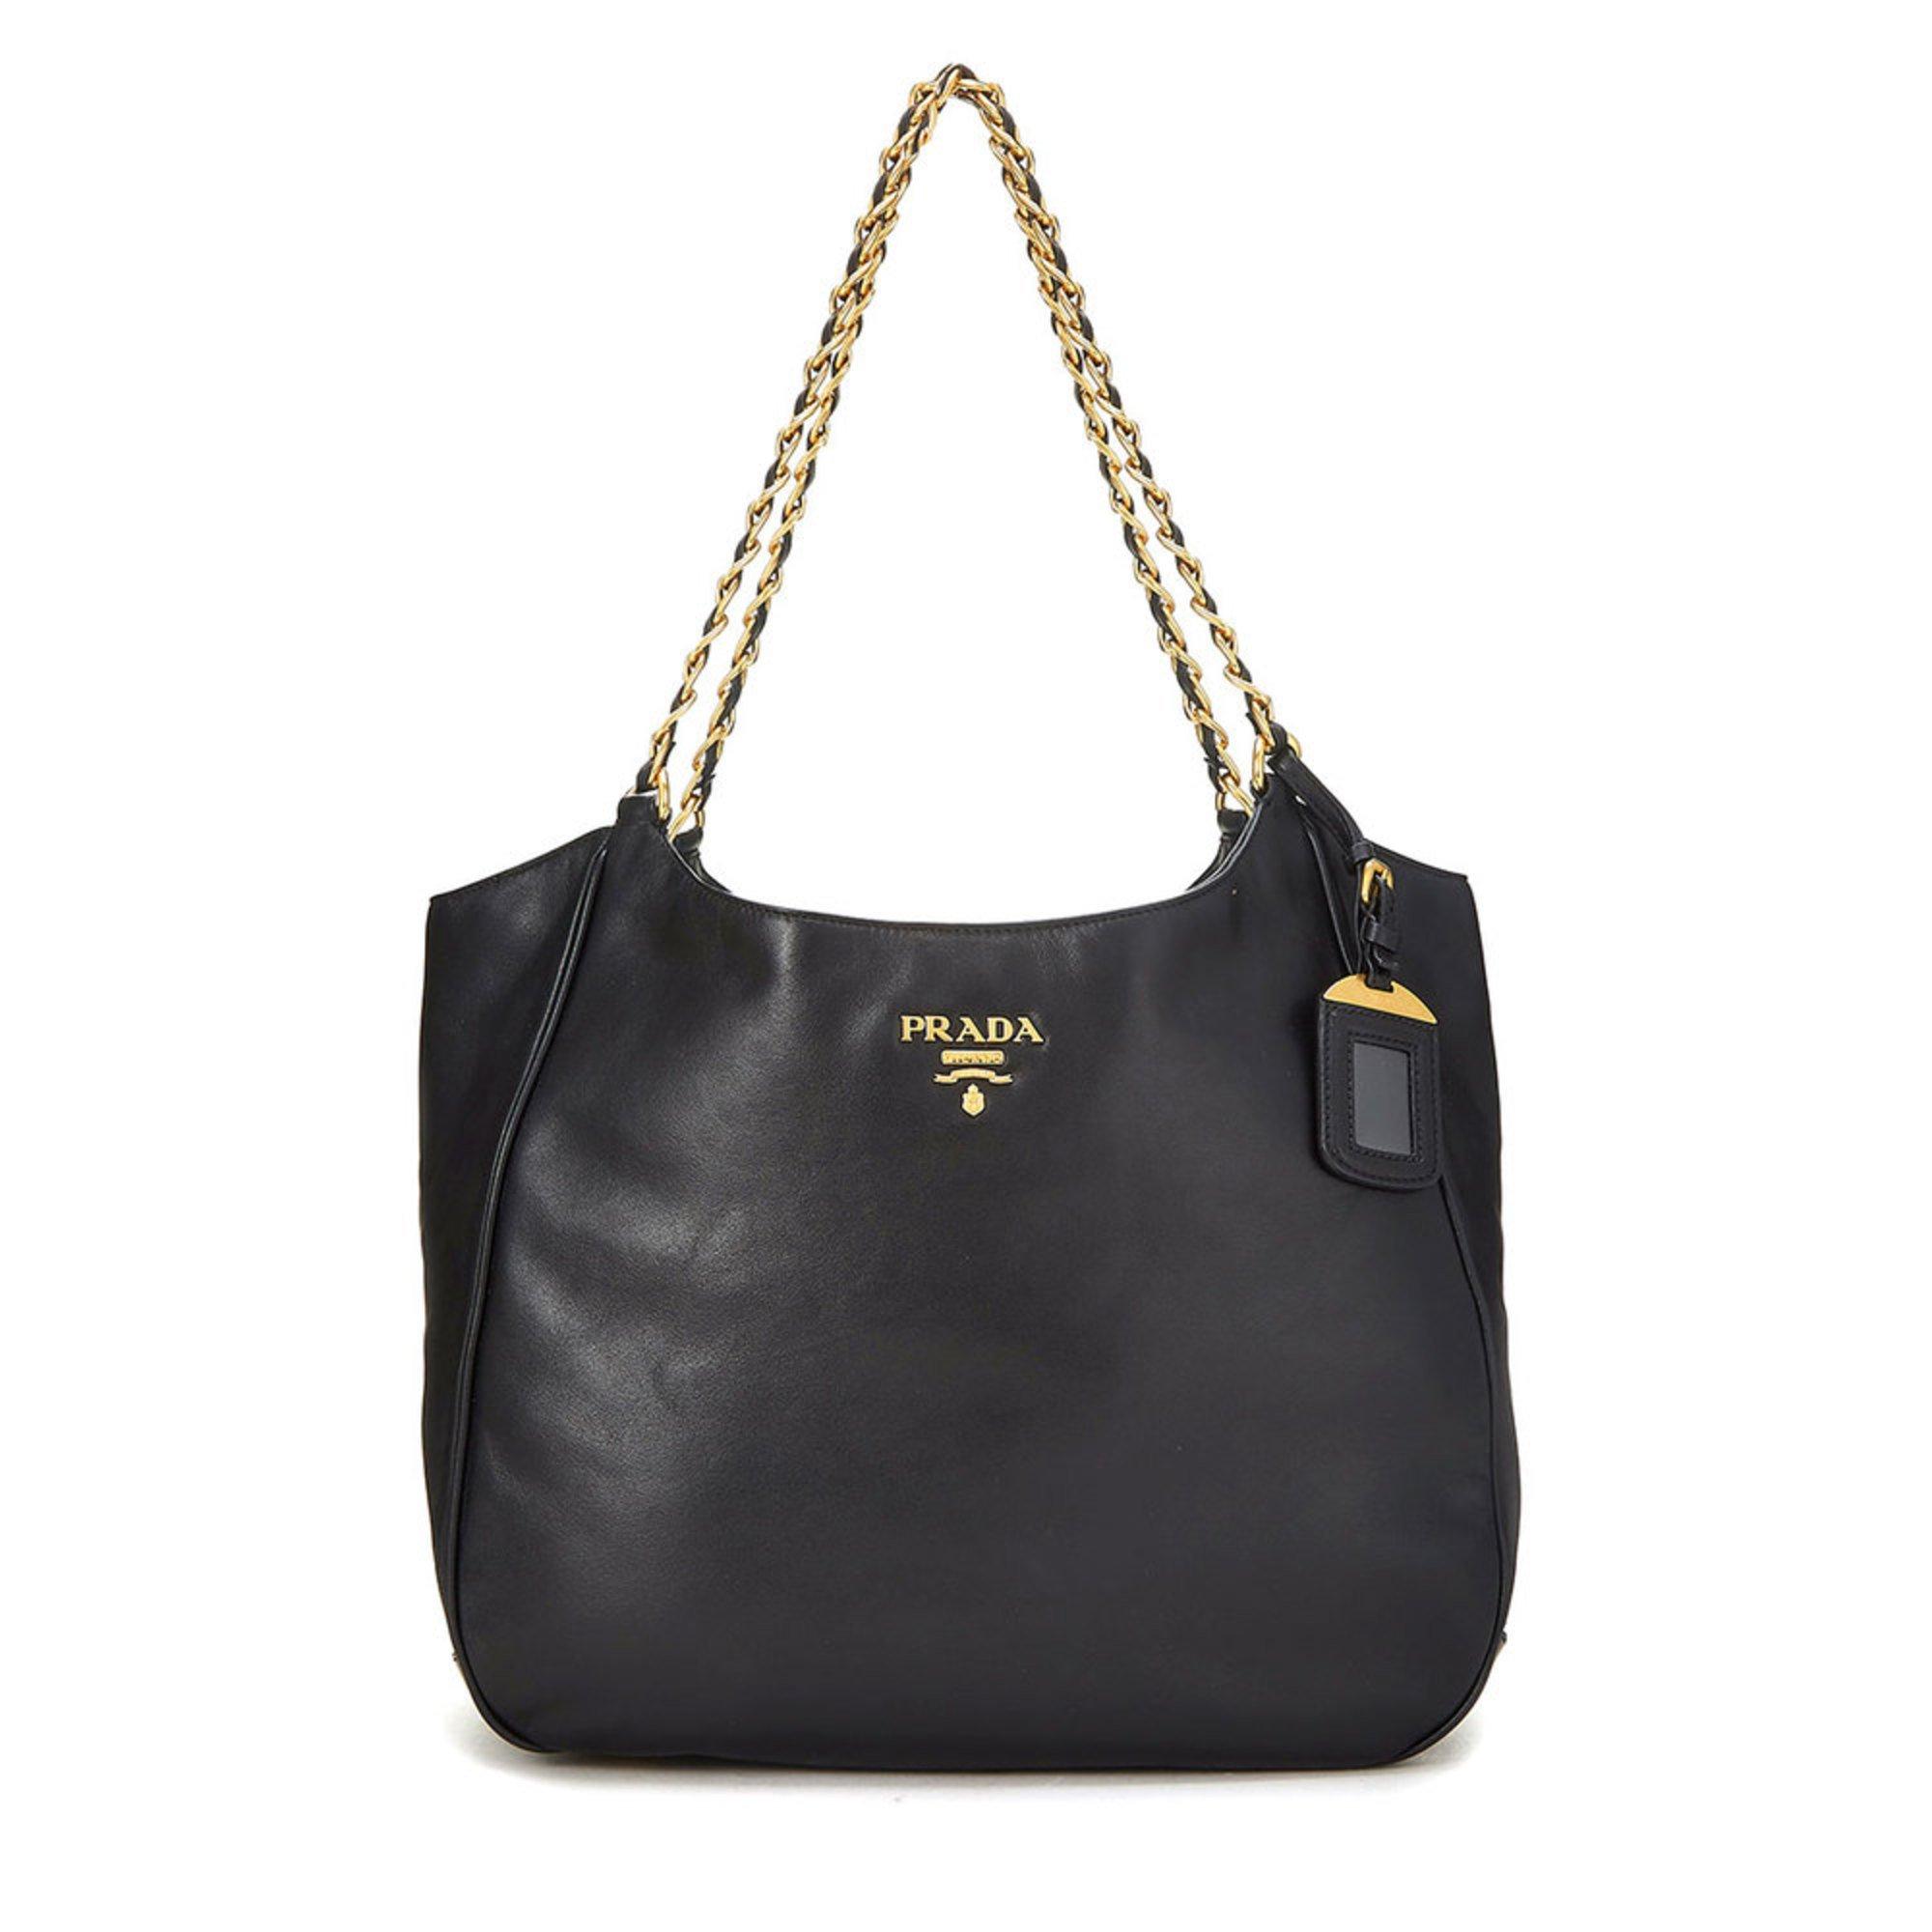 c3a8c1d46076 Prada Leather Tote Black